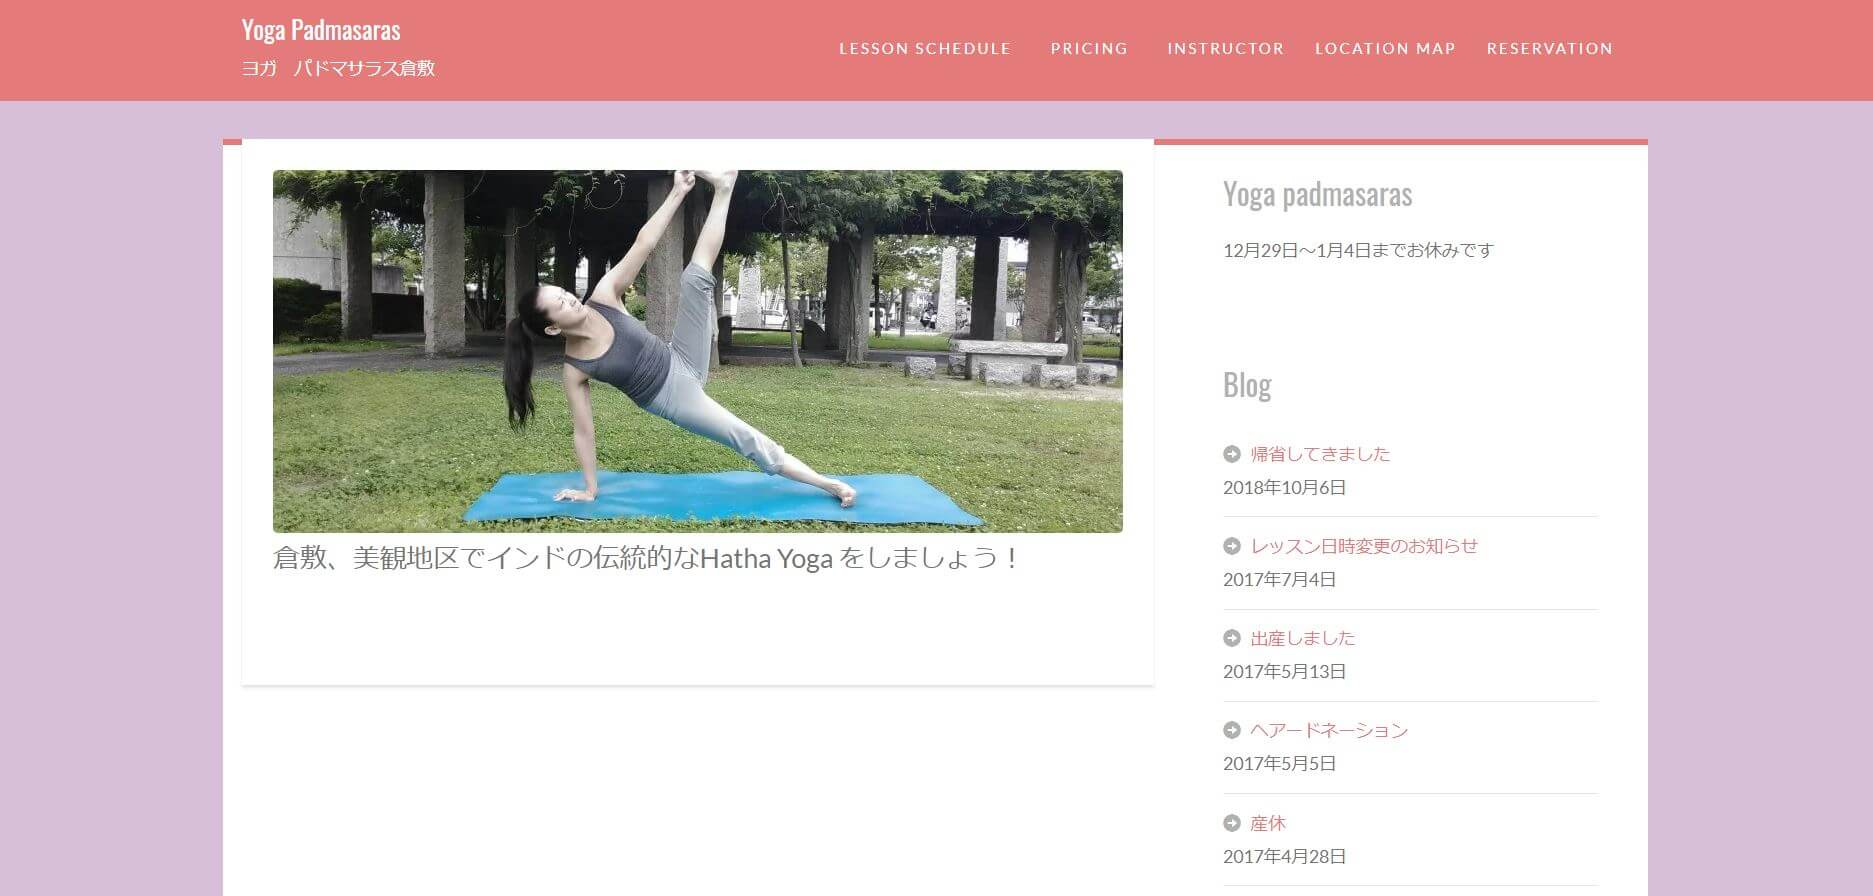 Yoga Padmasaras(ヨガ パドマサラス) 倉敷